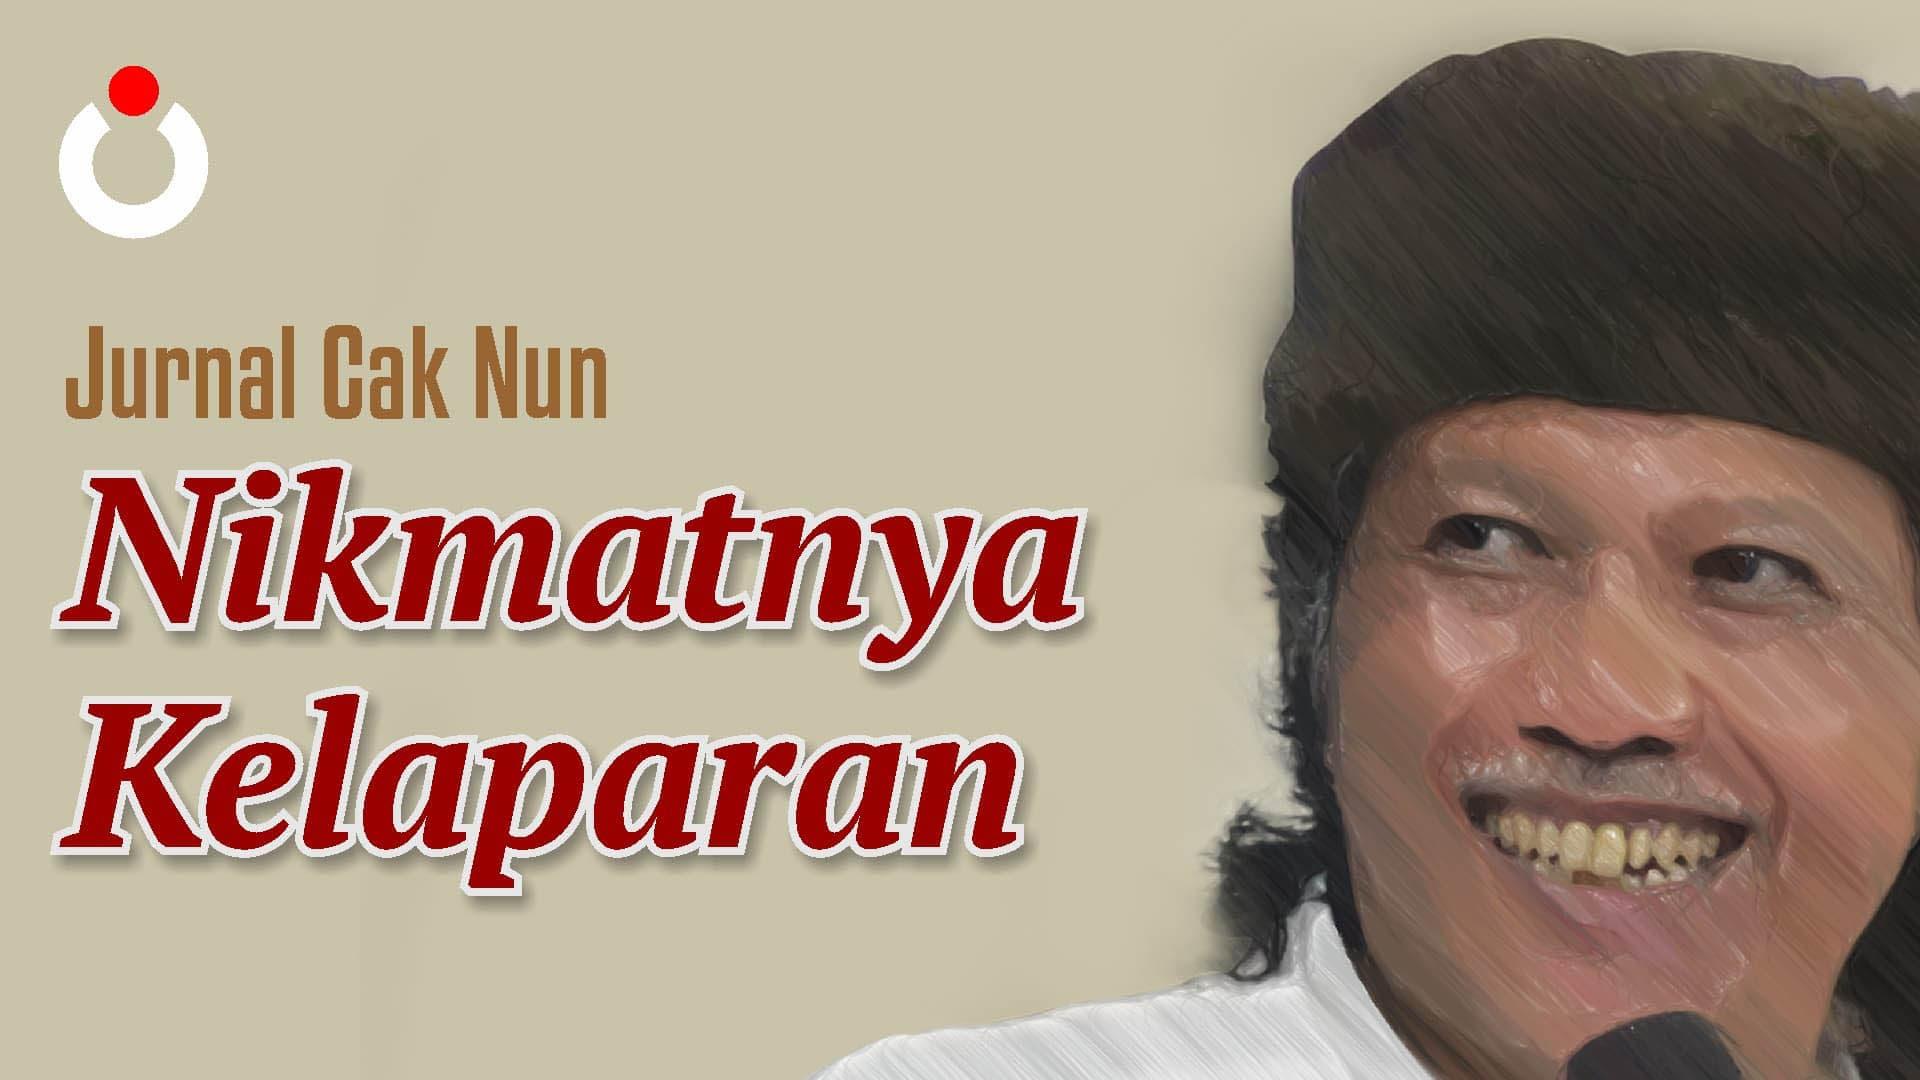 Jurnal Cak Nun – Nikmatnya Kelaparan